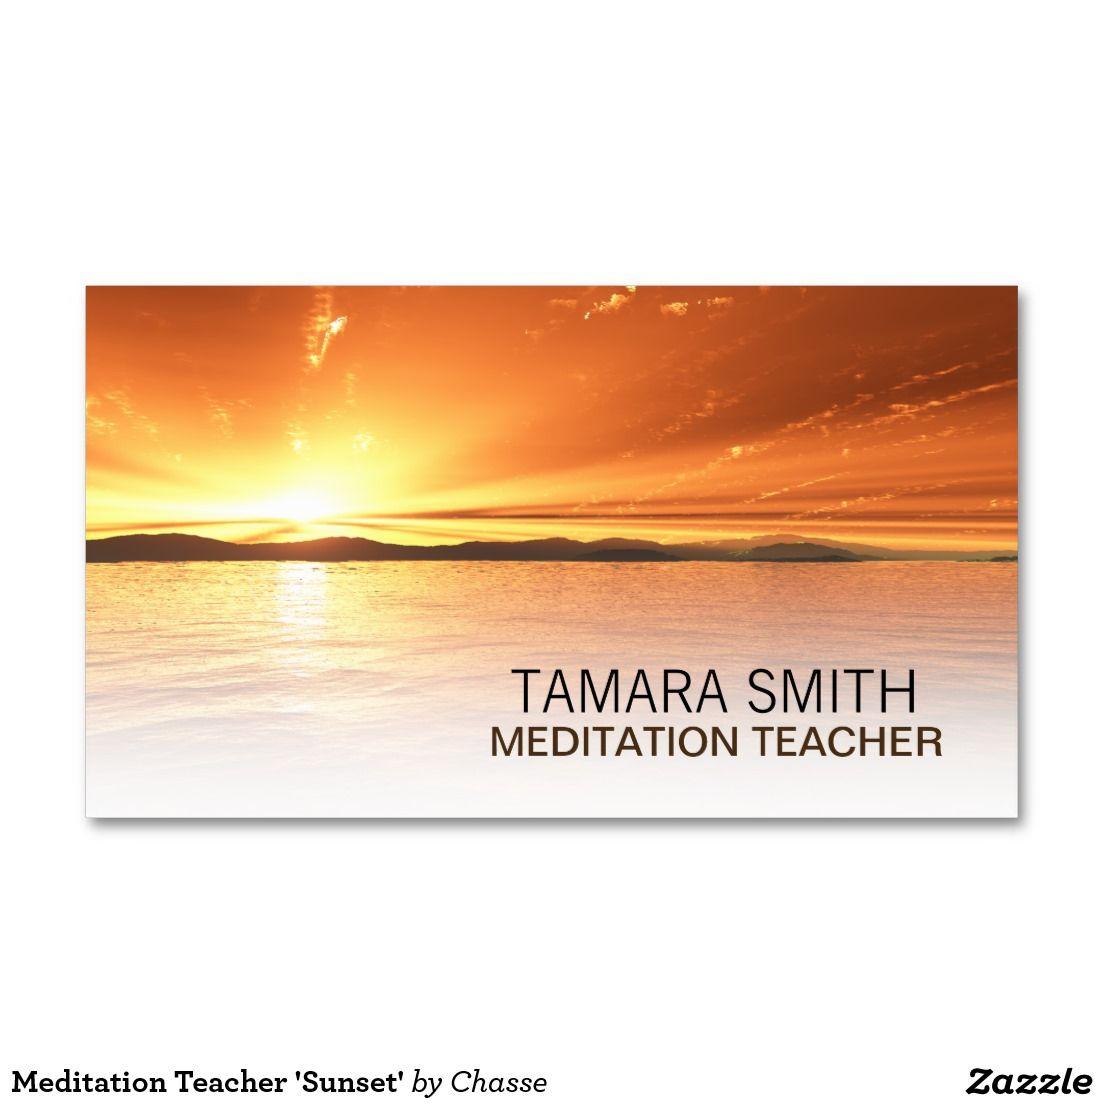 Meditation Teacher \'Sunset\' Business Card | Business cards and Business